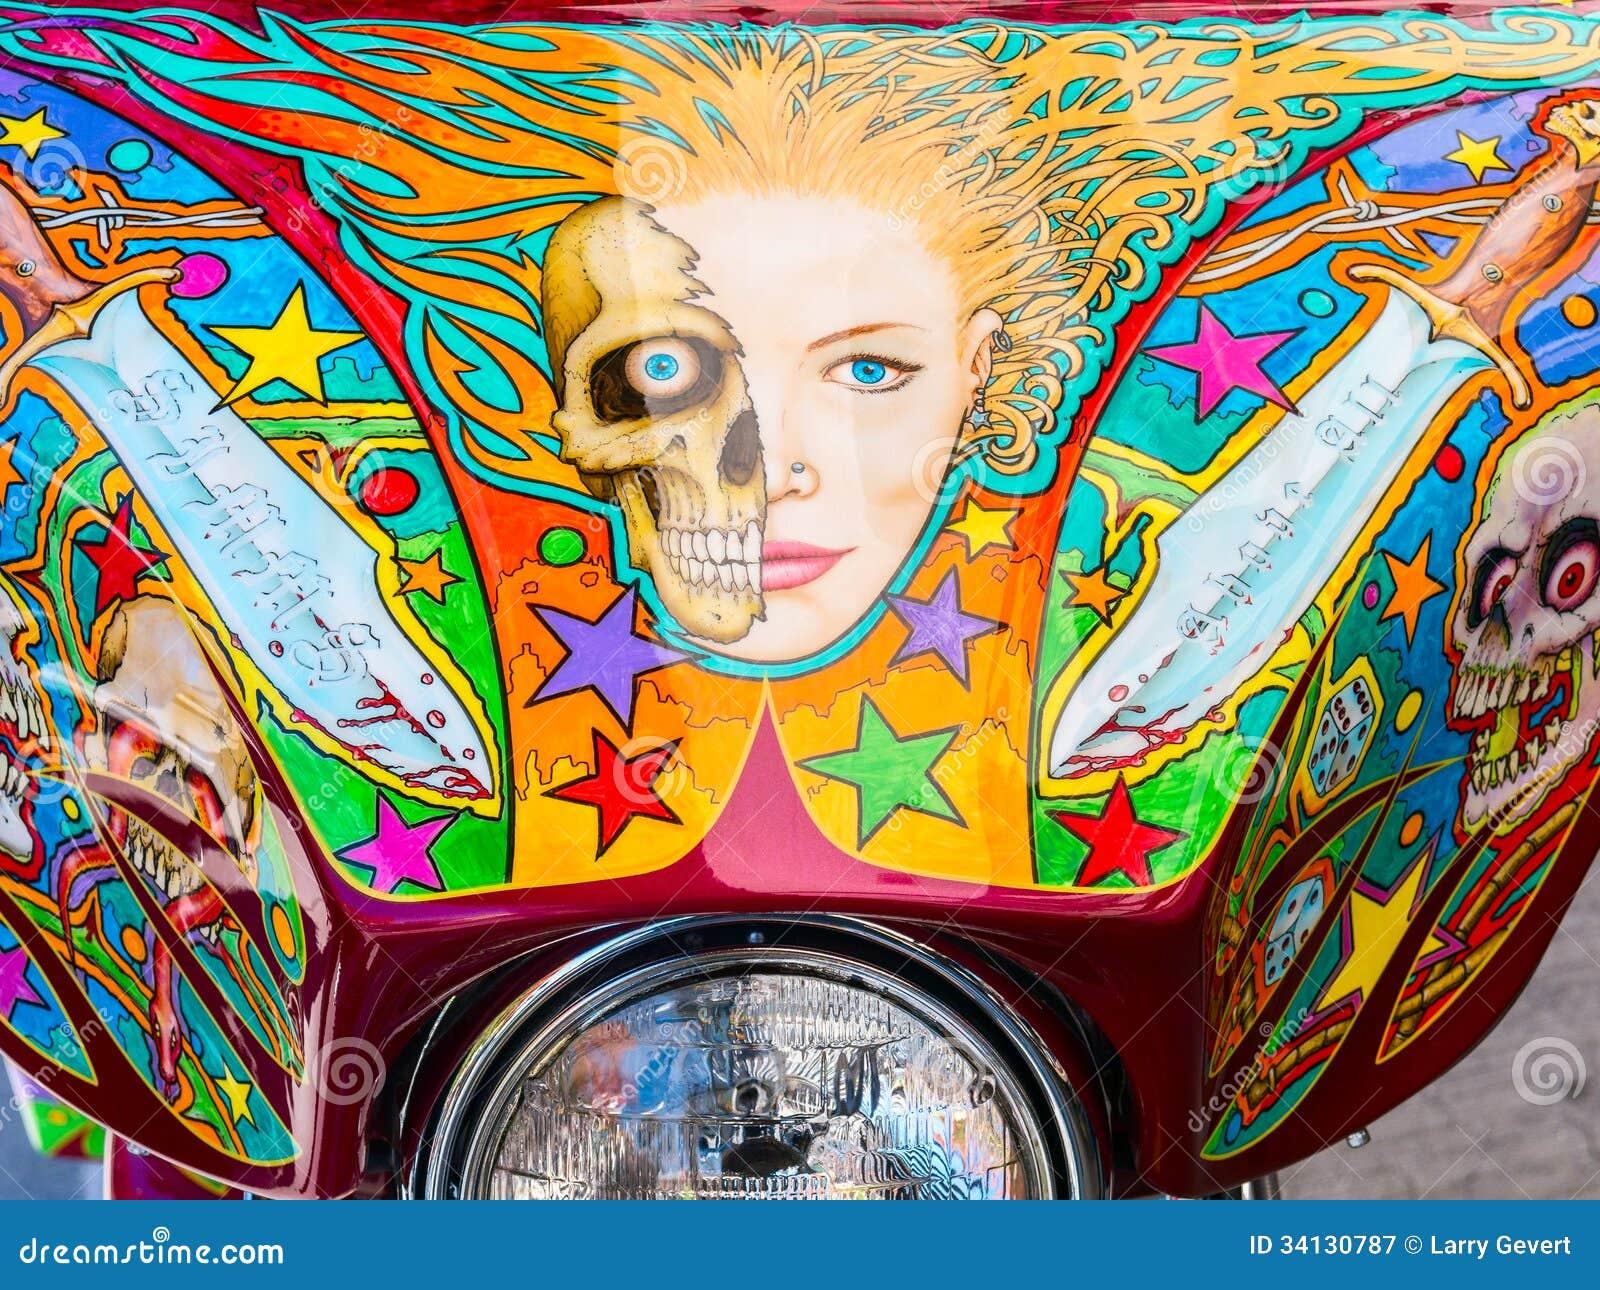 wheel of time desktop wallpaper